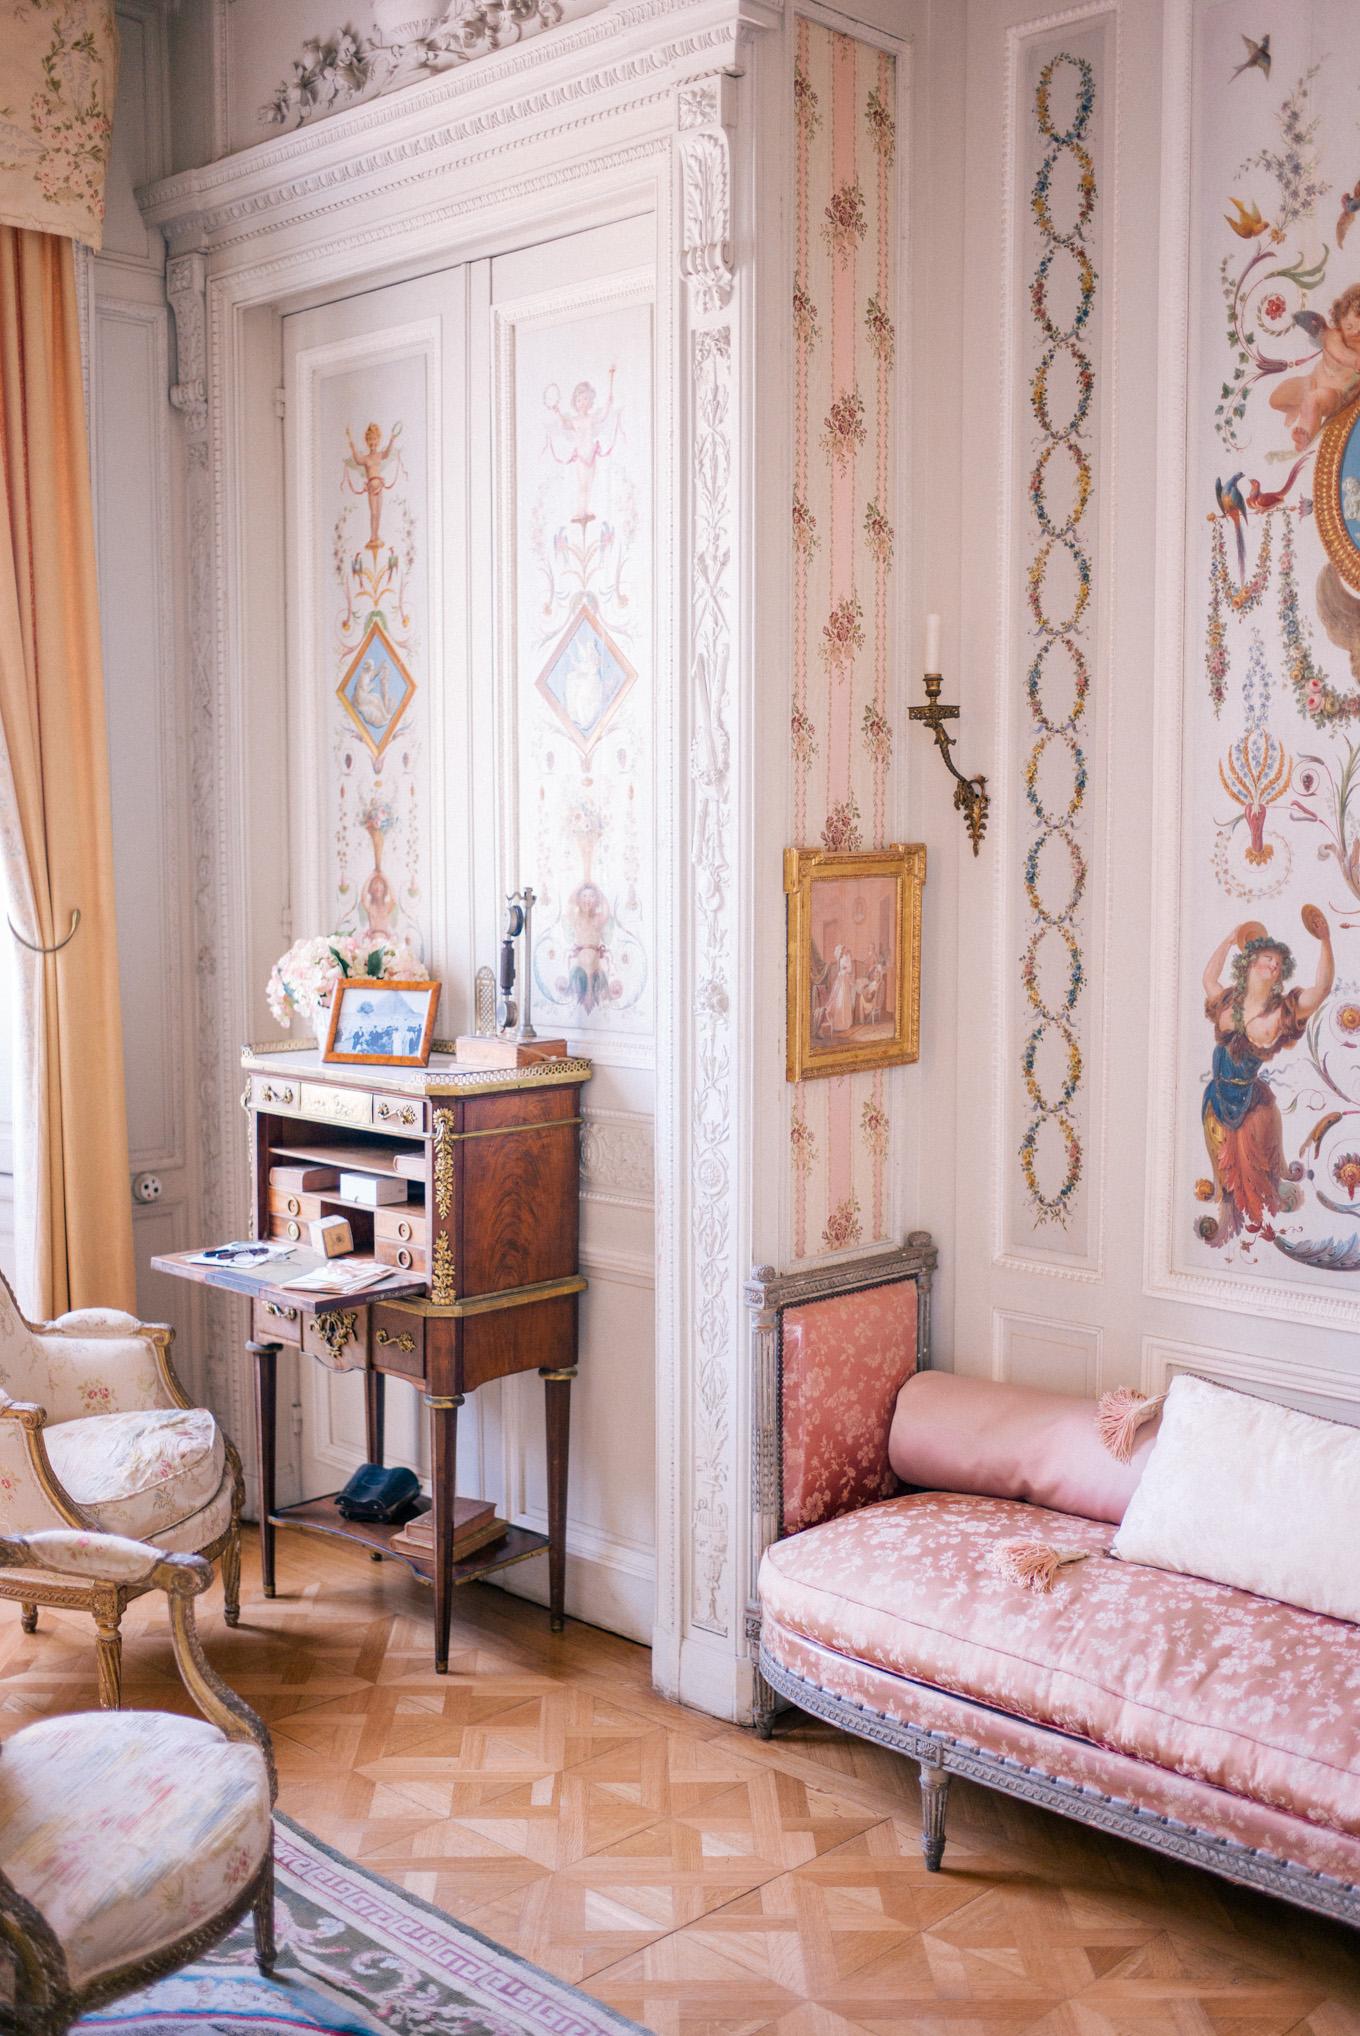 gmg-Villa-Ephrussi-de-Rothschild- france-1008738